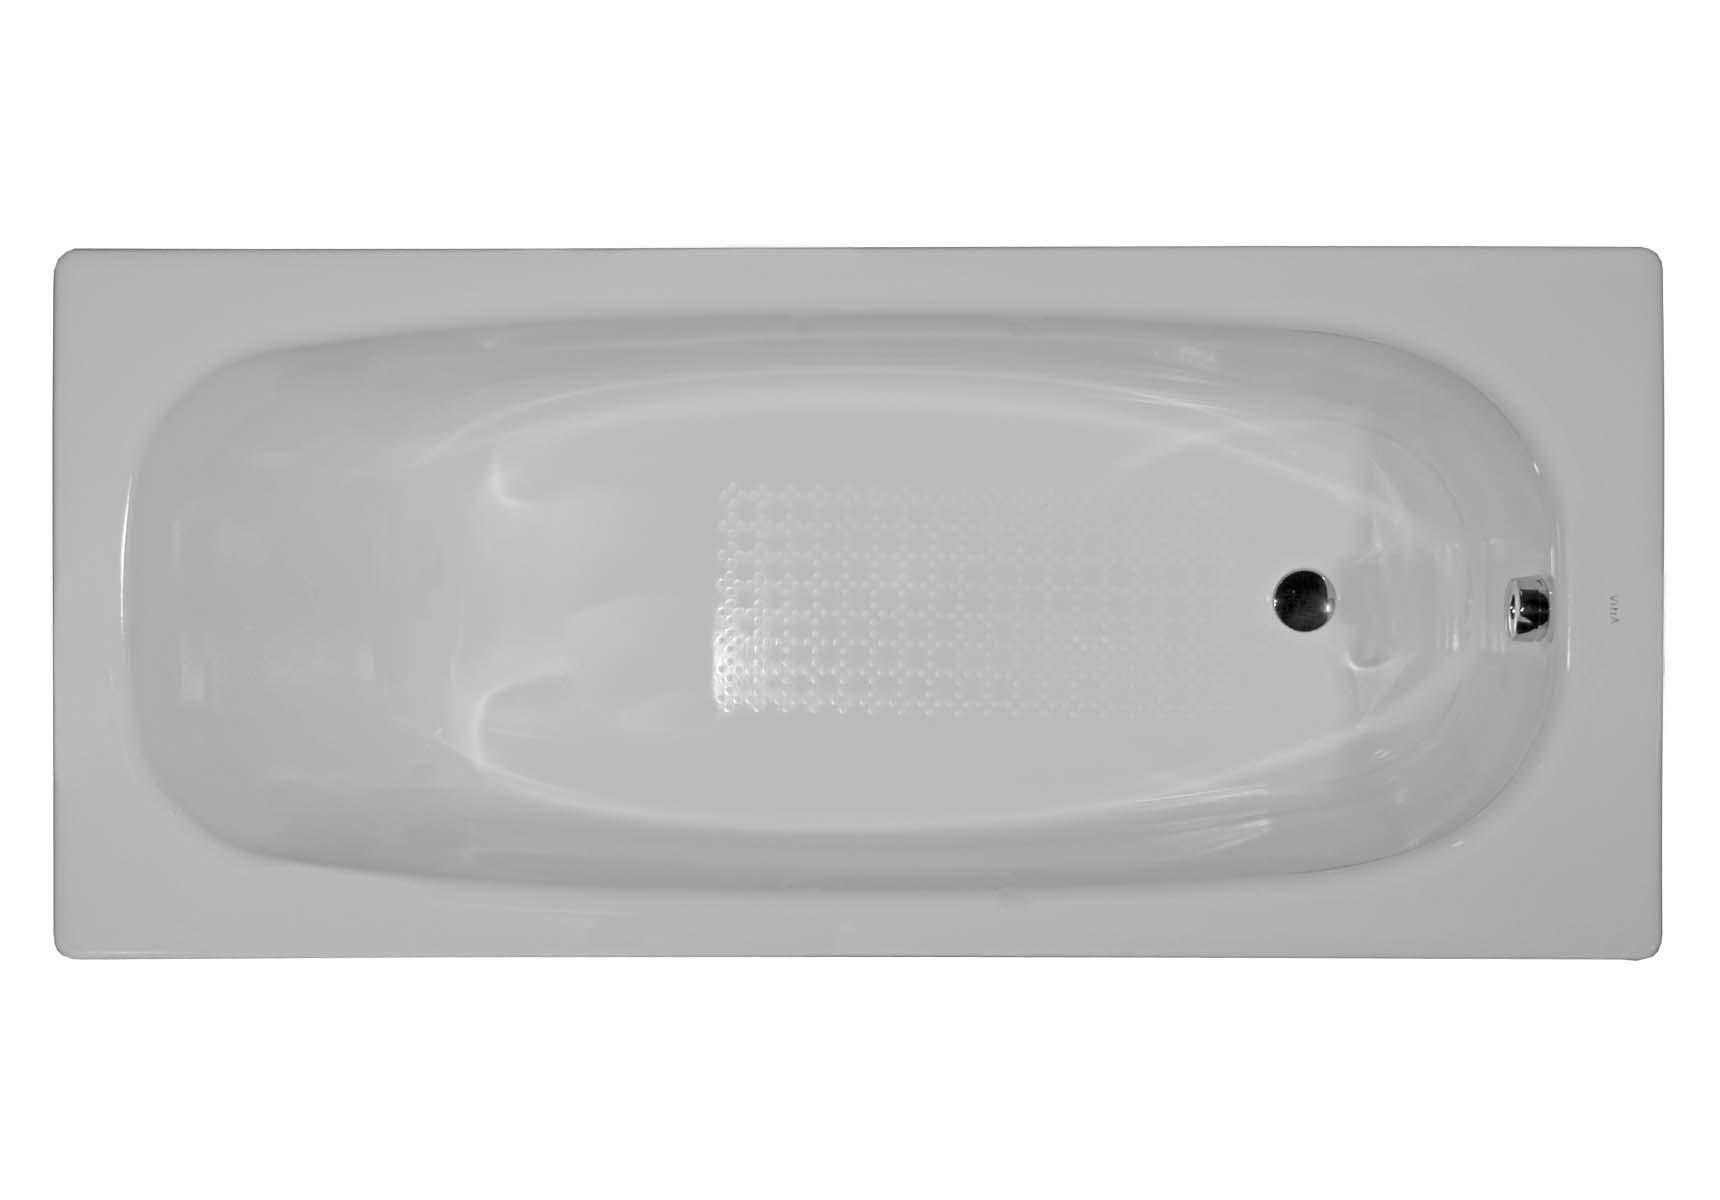 Generic 160x70 cm Steel Bathtub, 3.5 Mm, Sound Proofing Pad, Low Depth